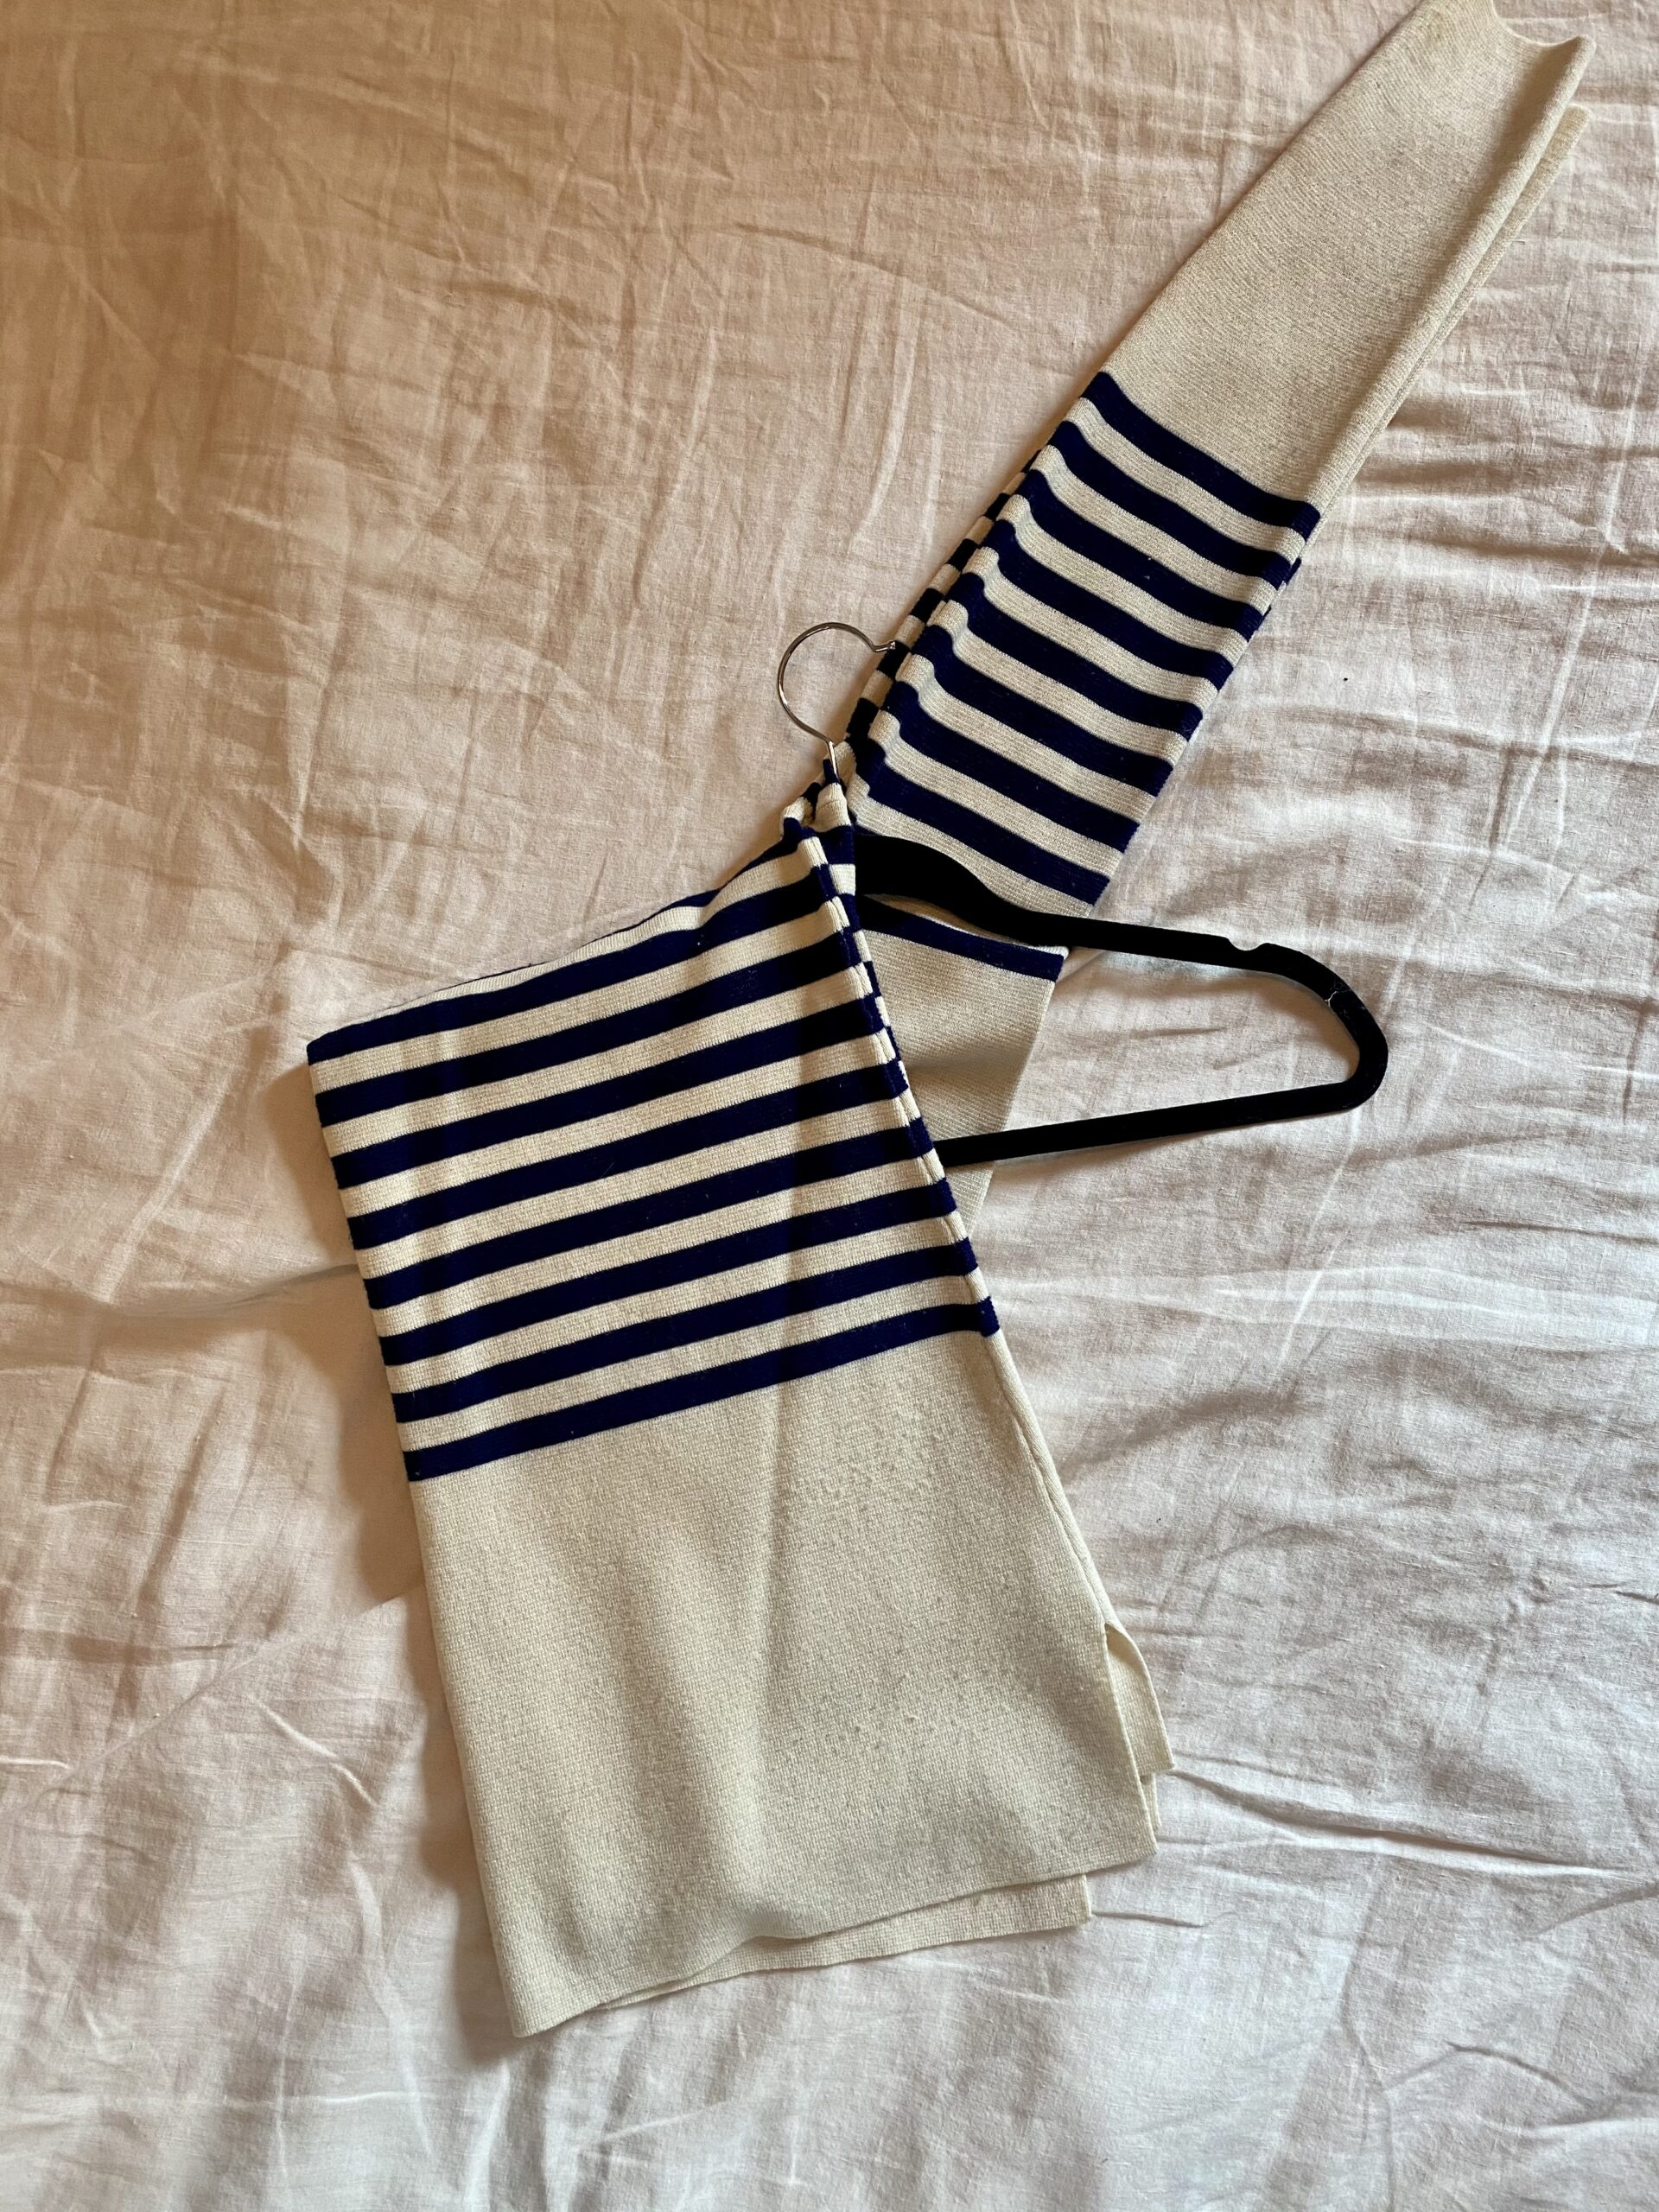 Sweater Folding Trick step 3